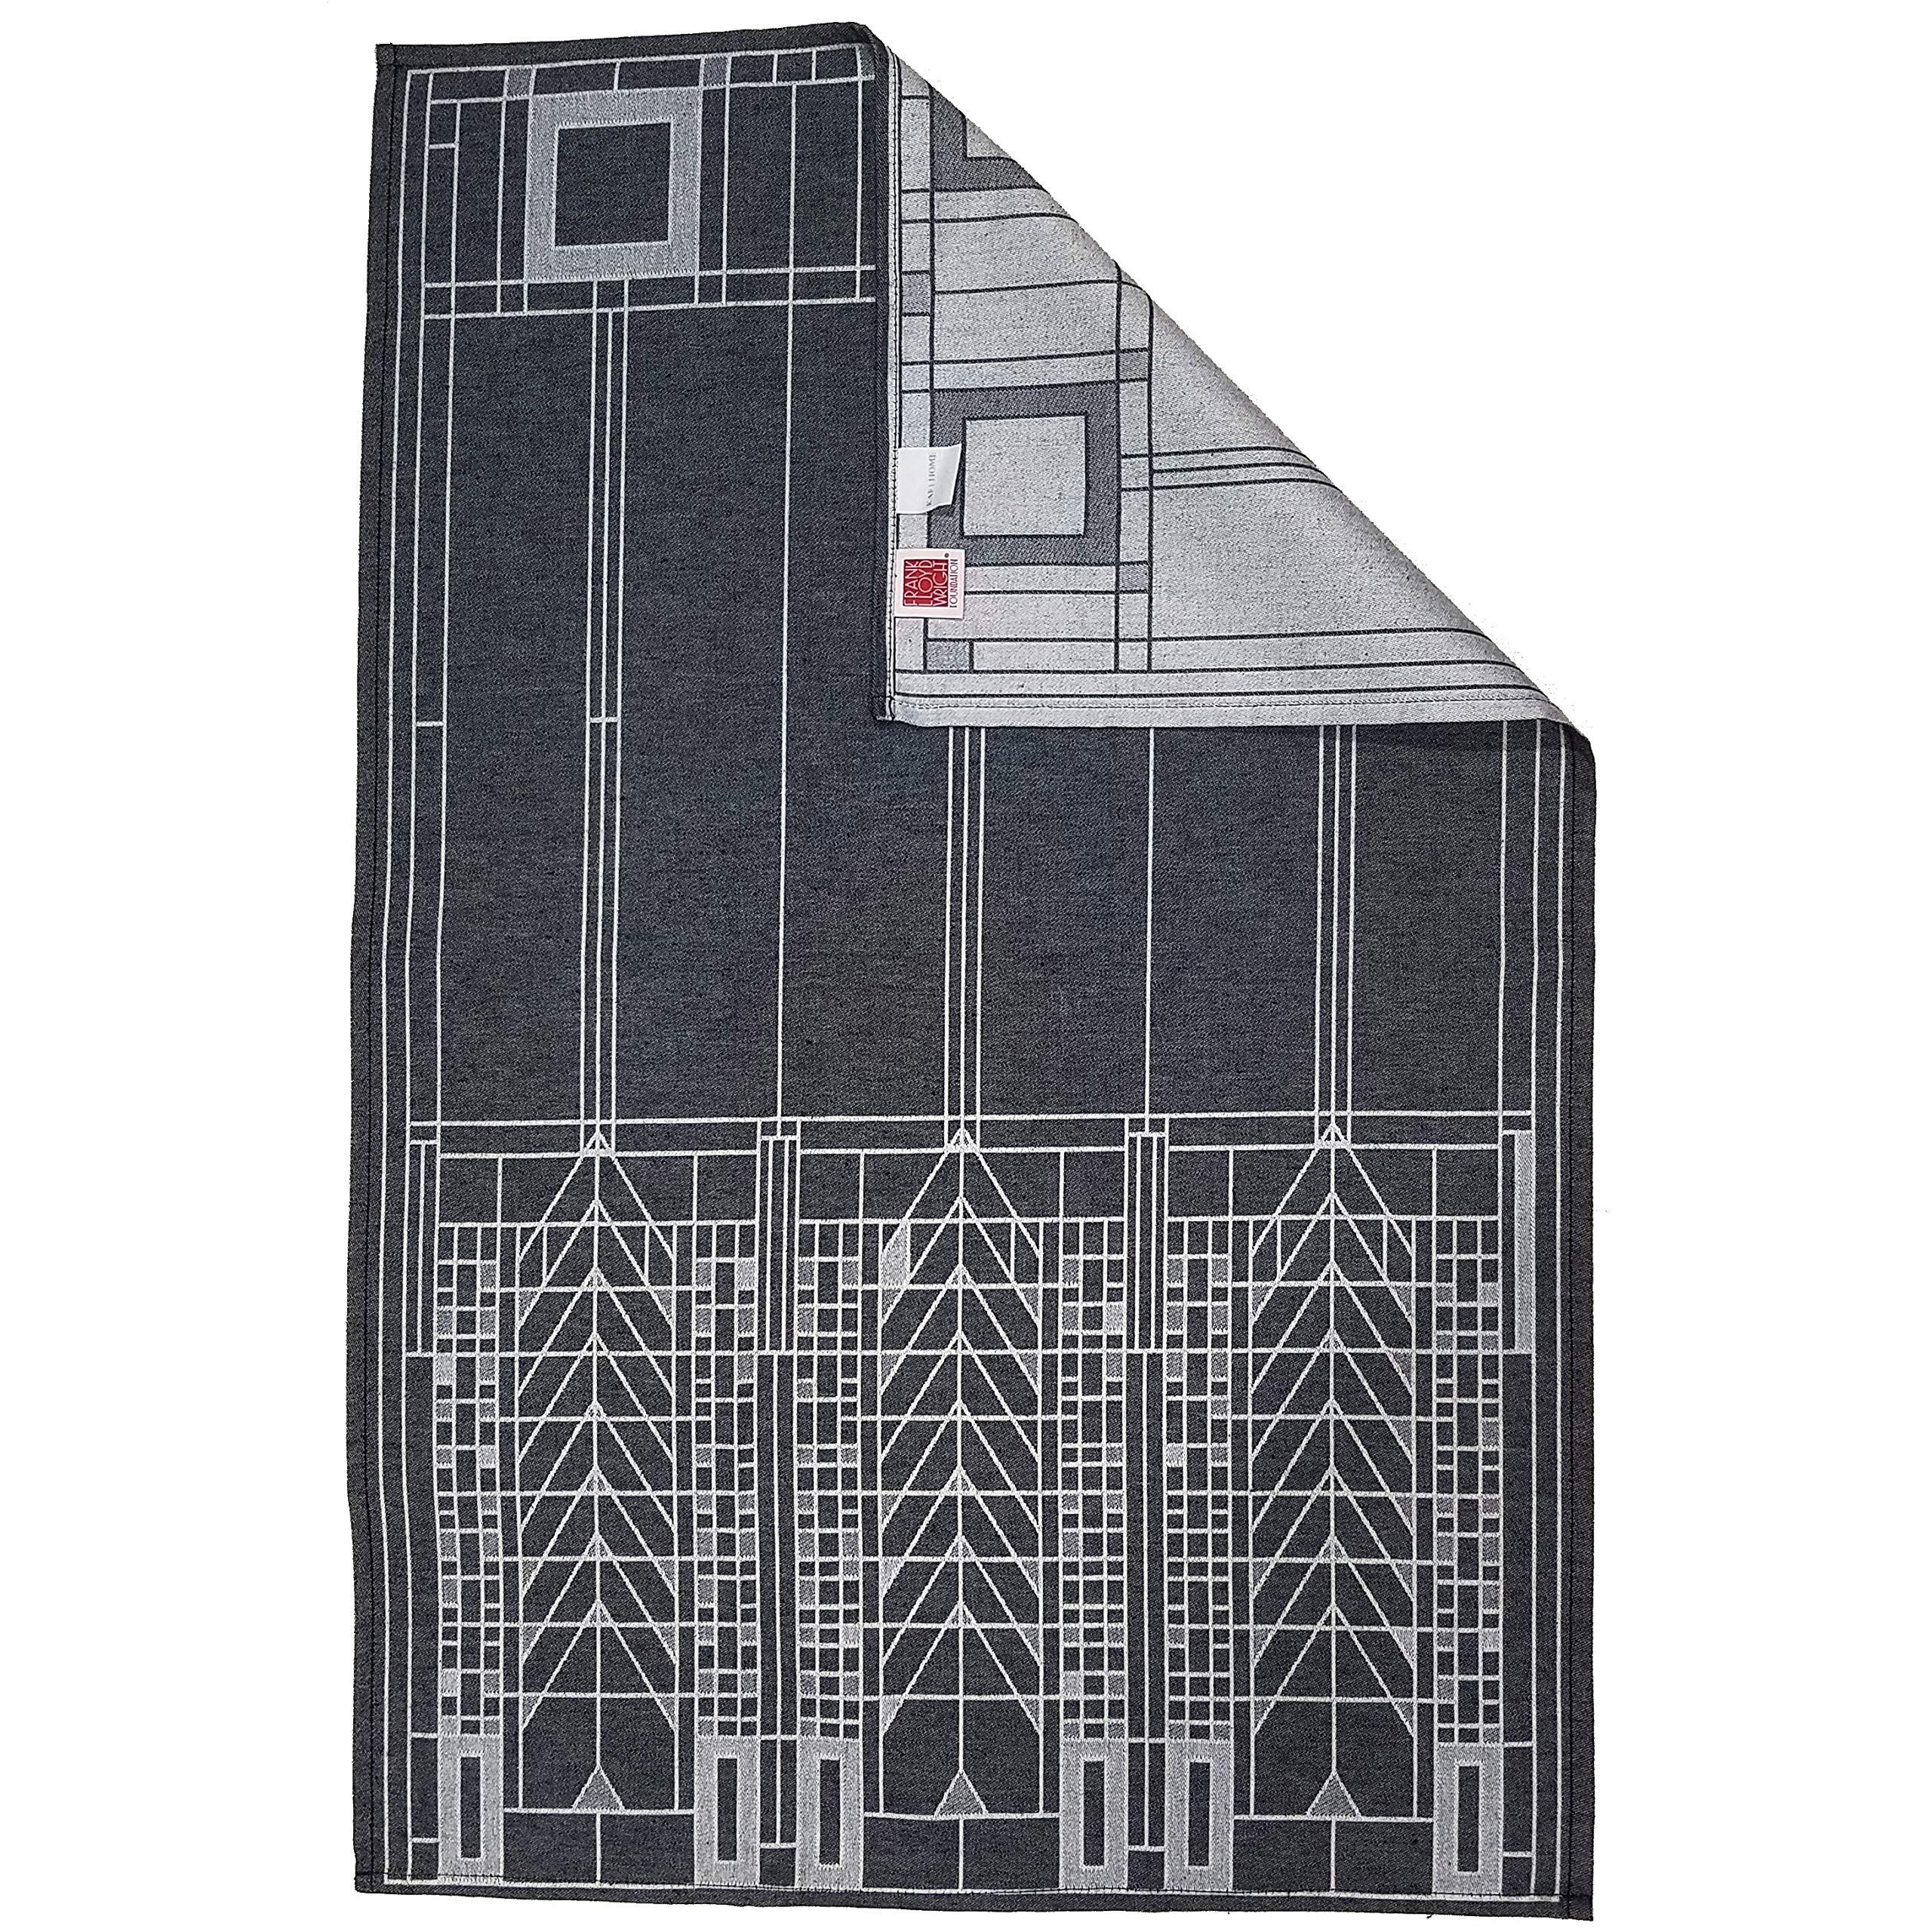 KAF Home Frank Lloyd Wright Woven Jacquard Tea Towel 20 x 30-inch 100-Percent Cotton (Tree of Life) by KAF Home (Image #2)